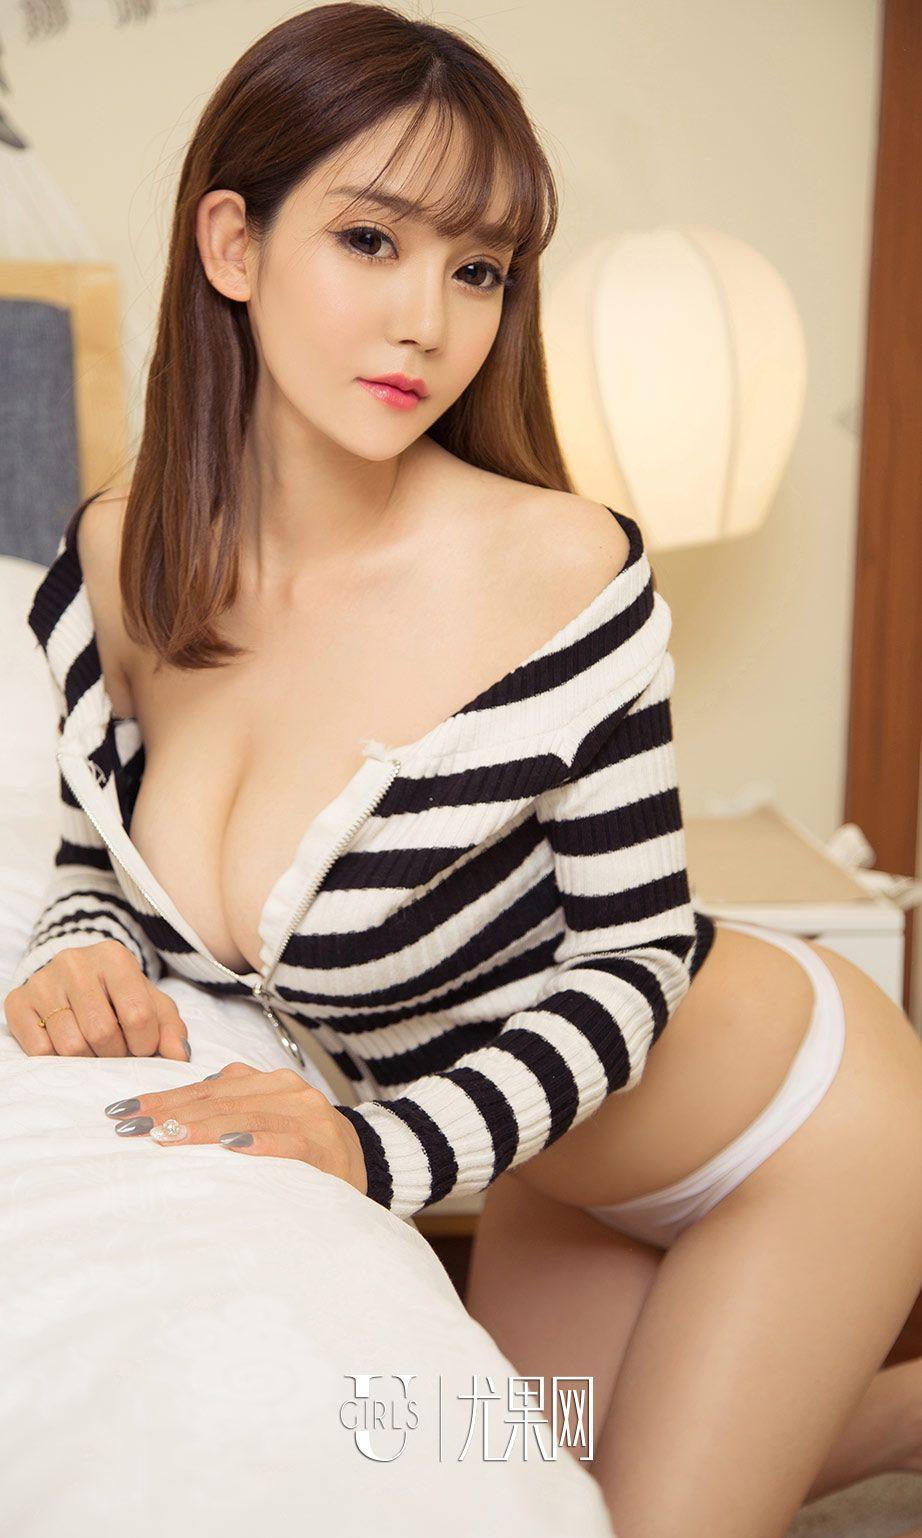 Model Hooker Xinqing